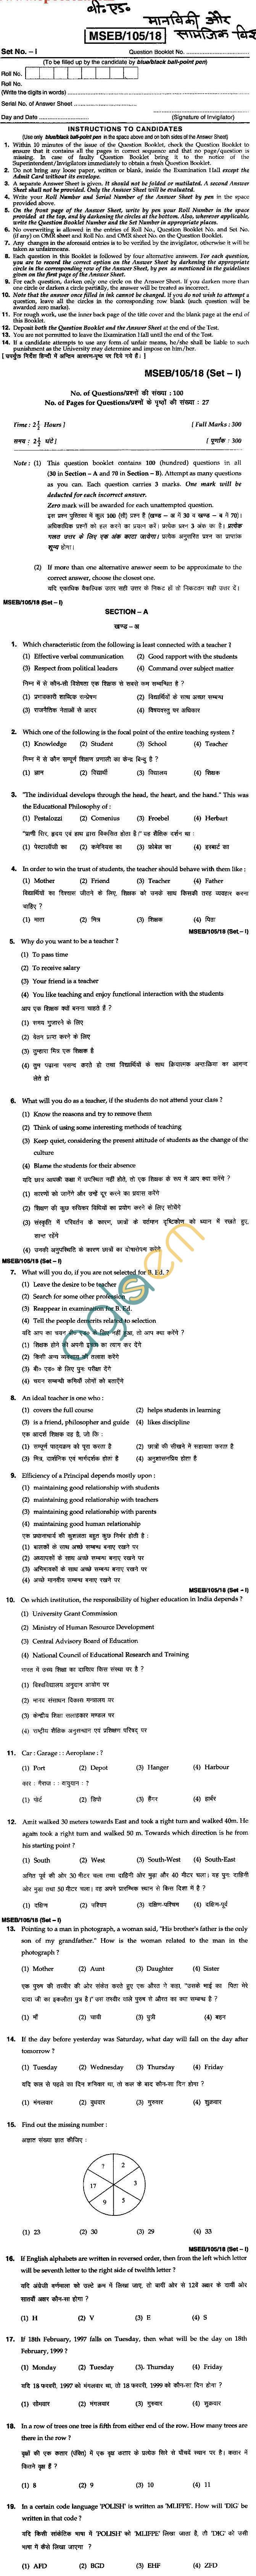 BHU UET 2010 B.Ed. Humanity & Social Science_Set-1 Question Paper